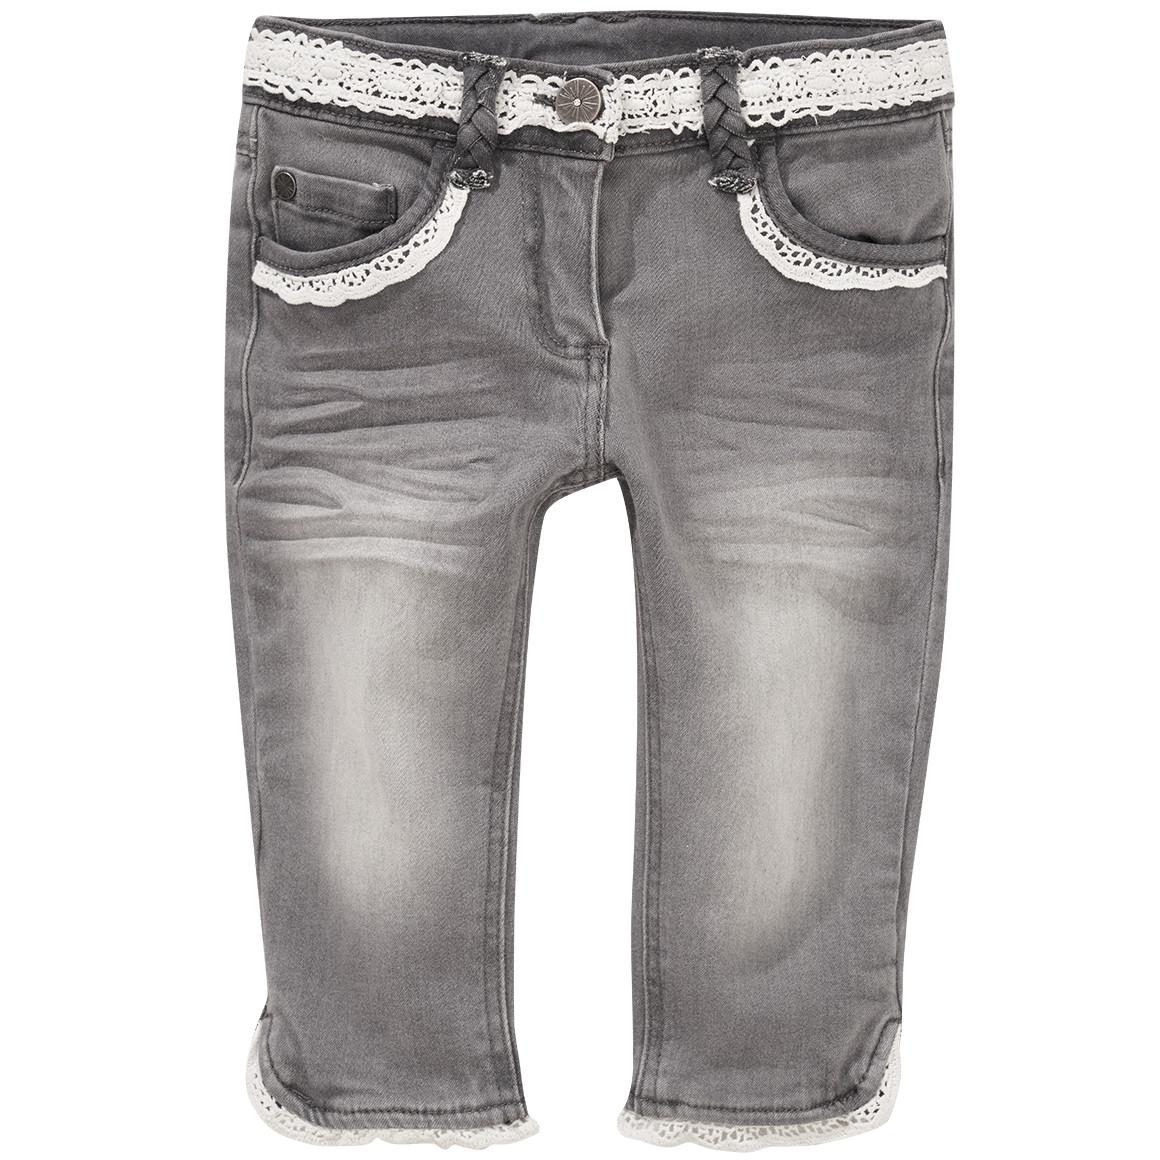 Mädchen Capri Jeans mit Spitze